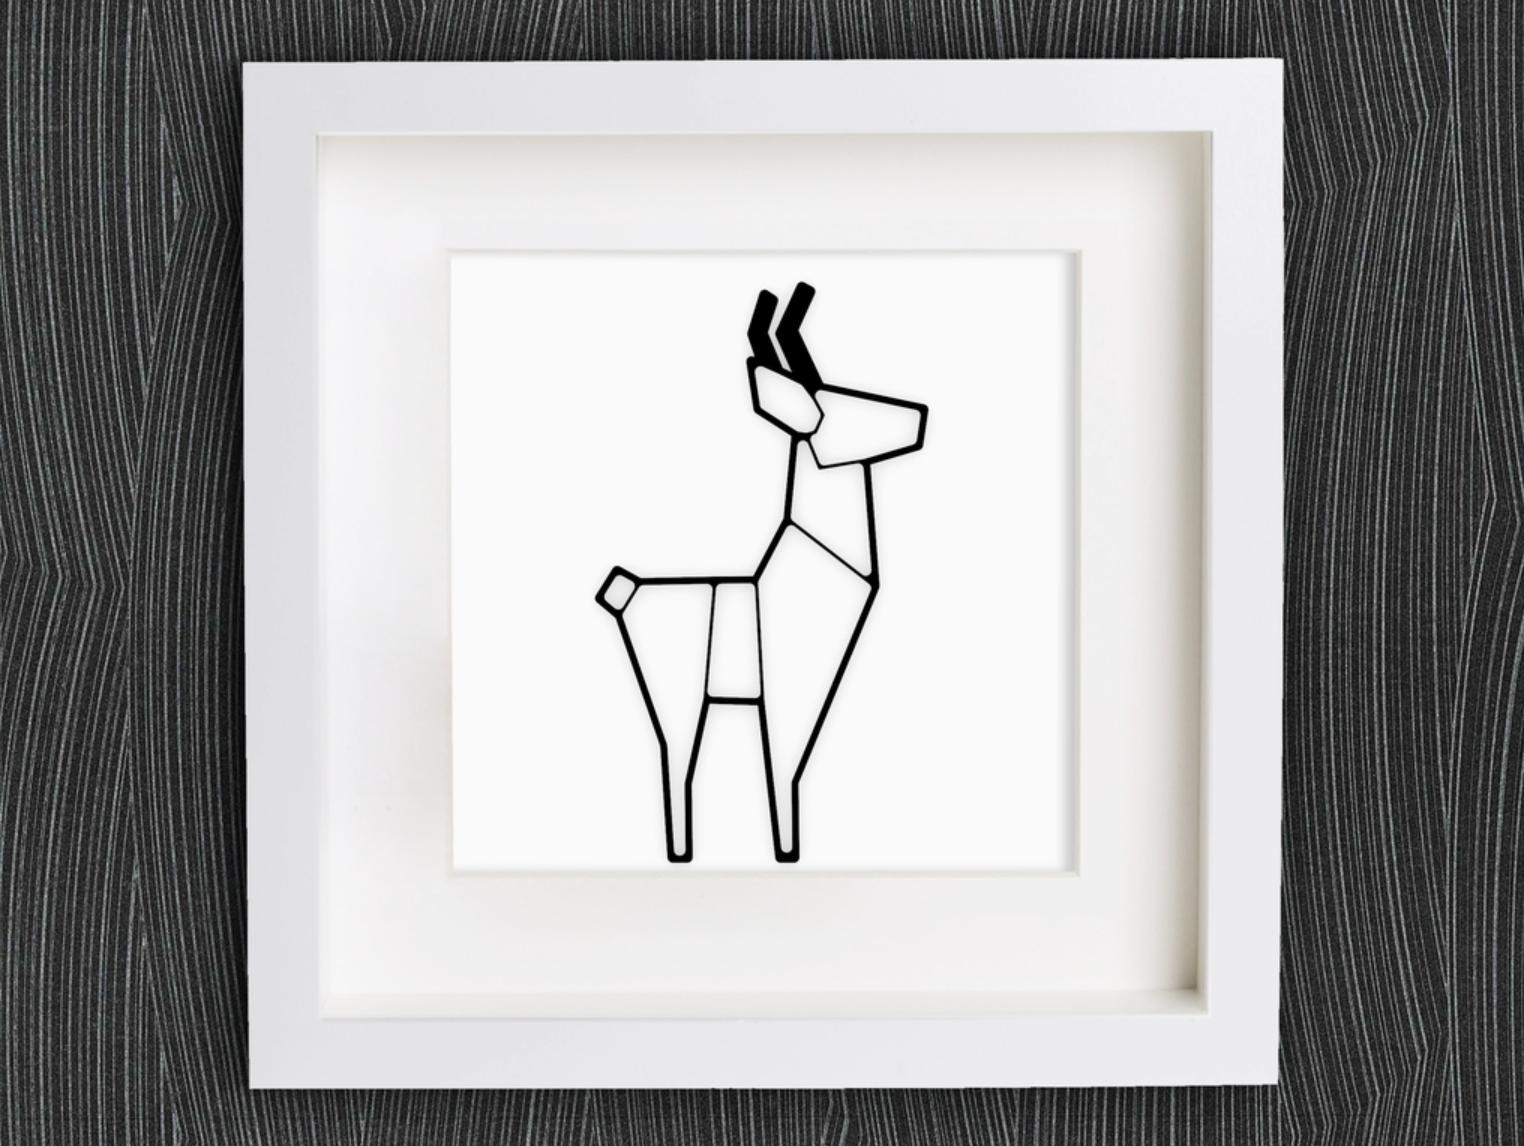 Capture d'écran 2017-11-27 à 10.33.10.png Download free STL file Customizable Origami Deer • 3D printer design, MightyNozzle